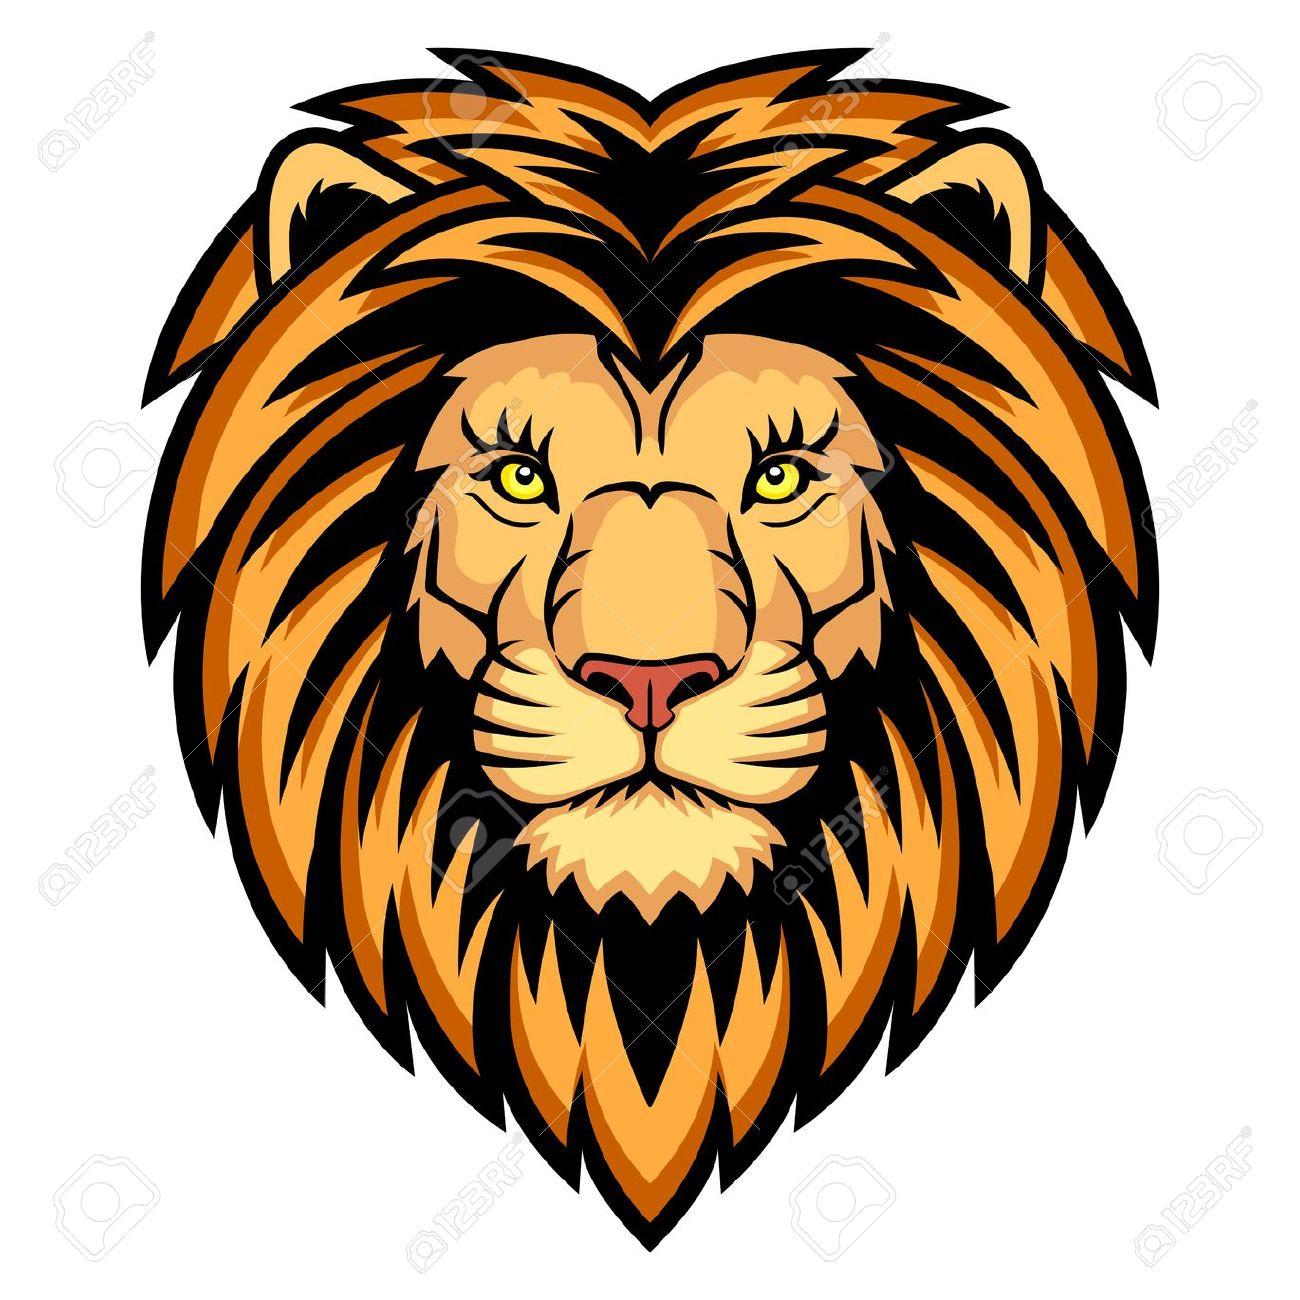 Animals lion face clipart svg transparent download Cartoon Lion Face Pictures   Free download best Cartoon Lion Face ... svg transparent download